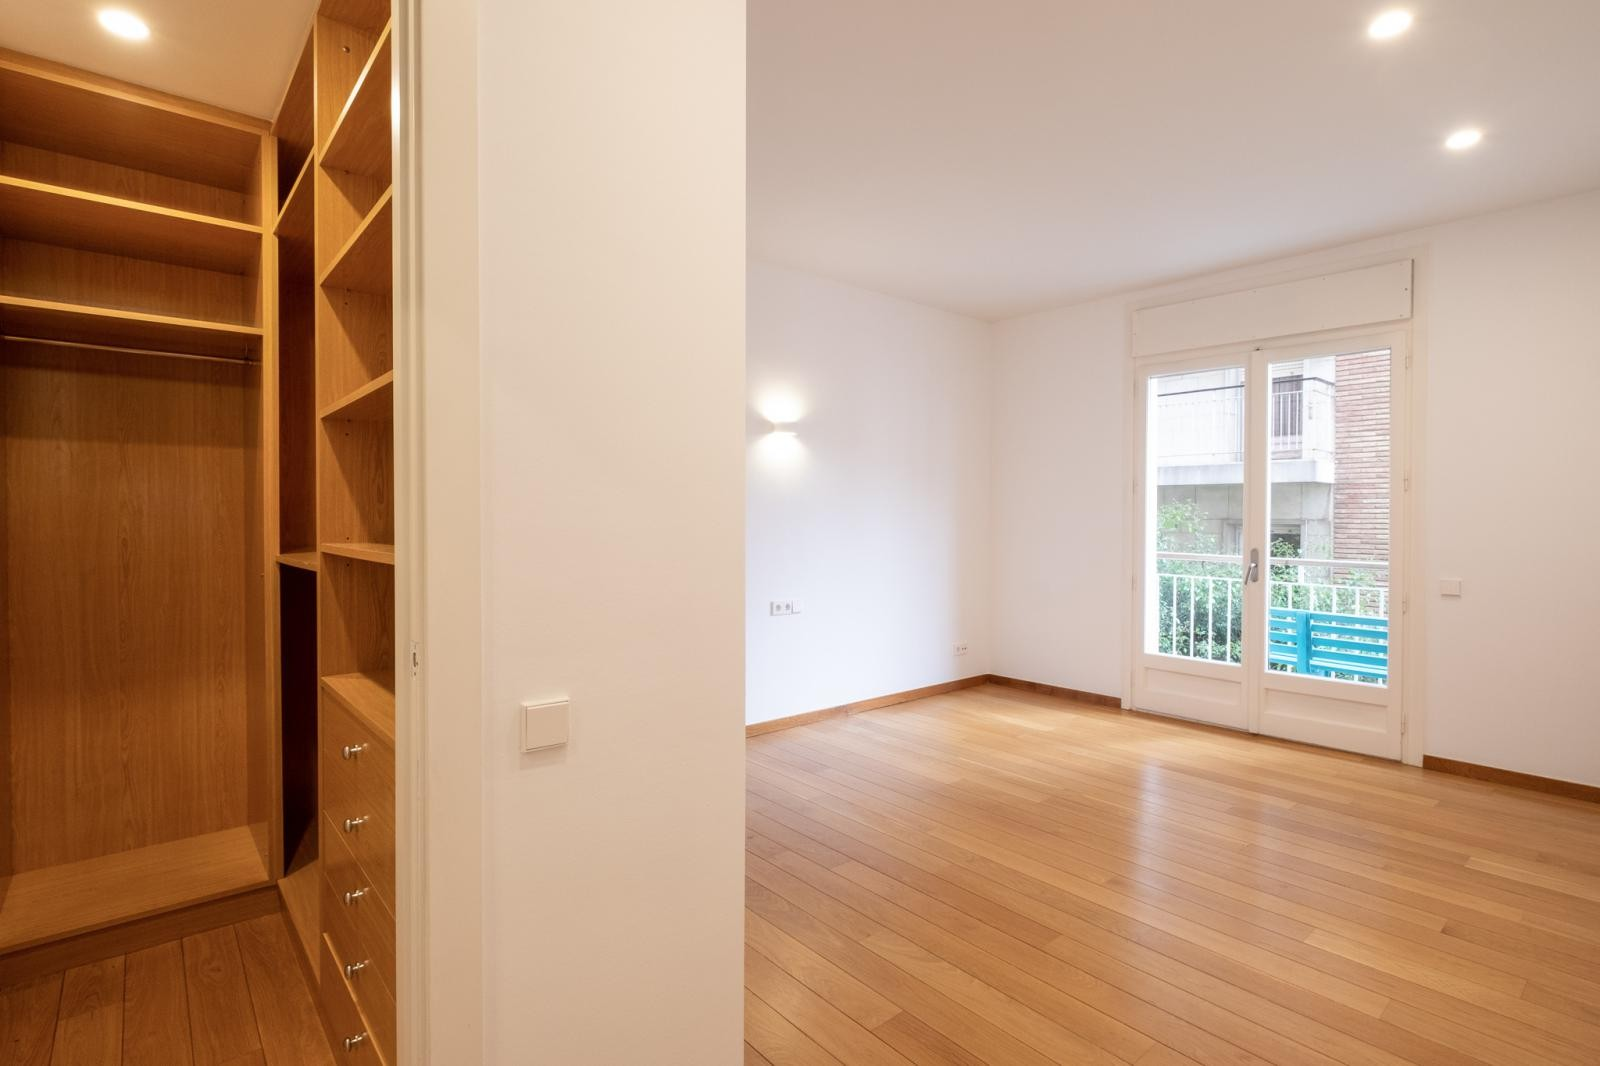 MG Inmobiliaria Barcelona - ganduxer-modolell